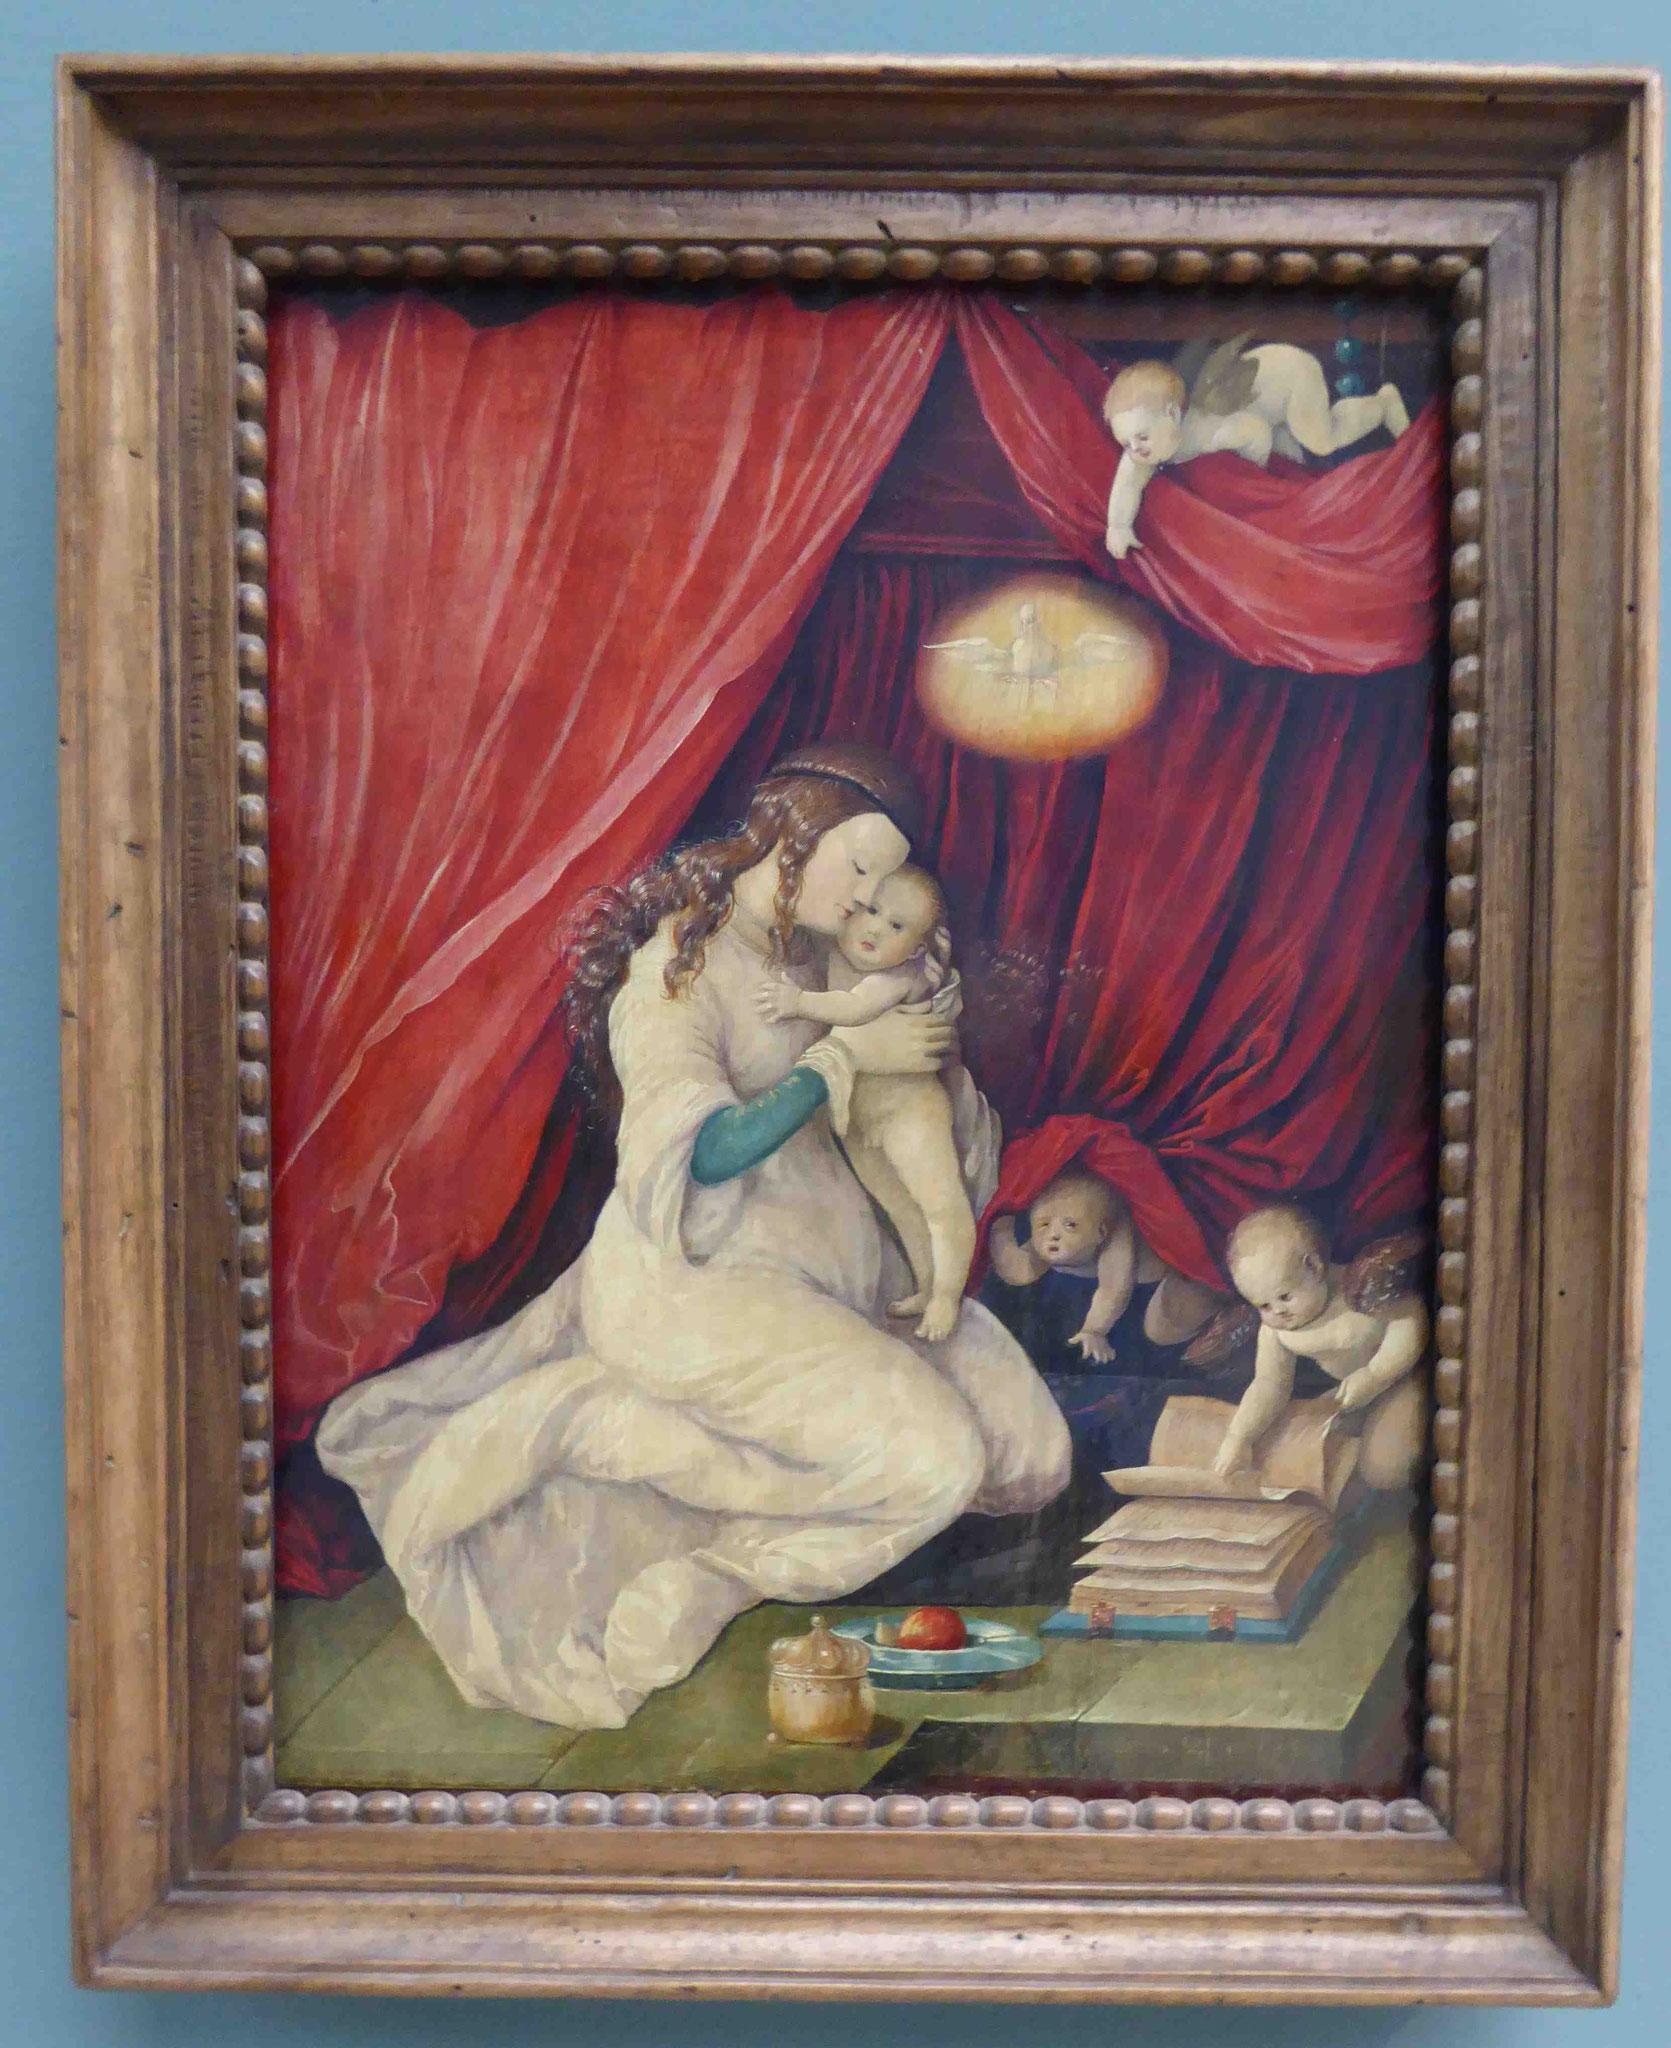 Madonna, Hans Baldung Grien, Germanisches Nationalmuseum Nürnberg